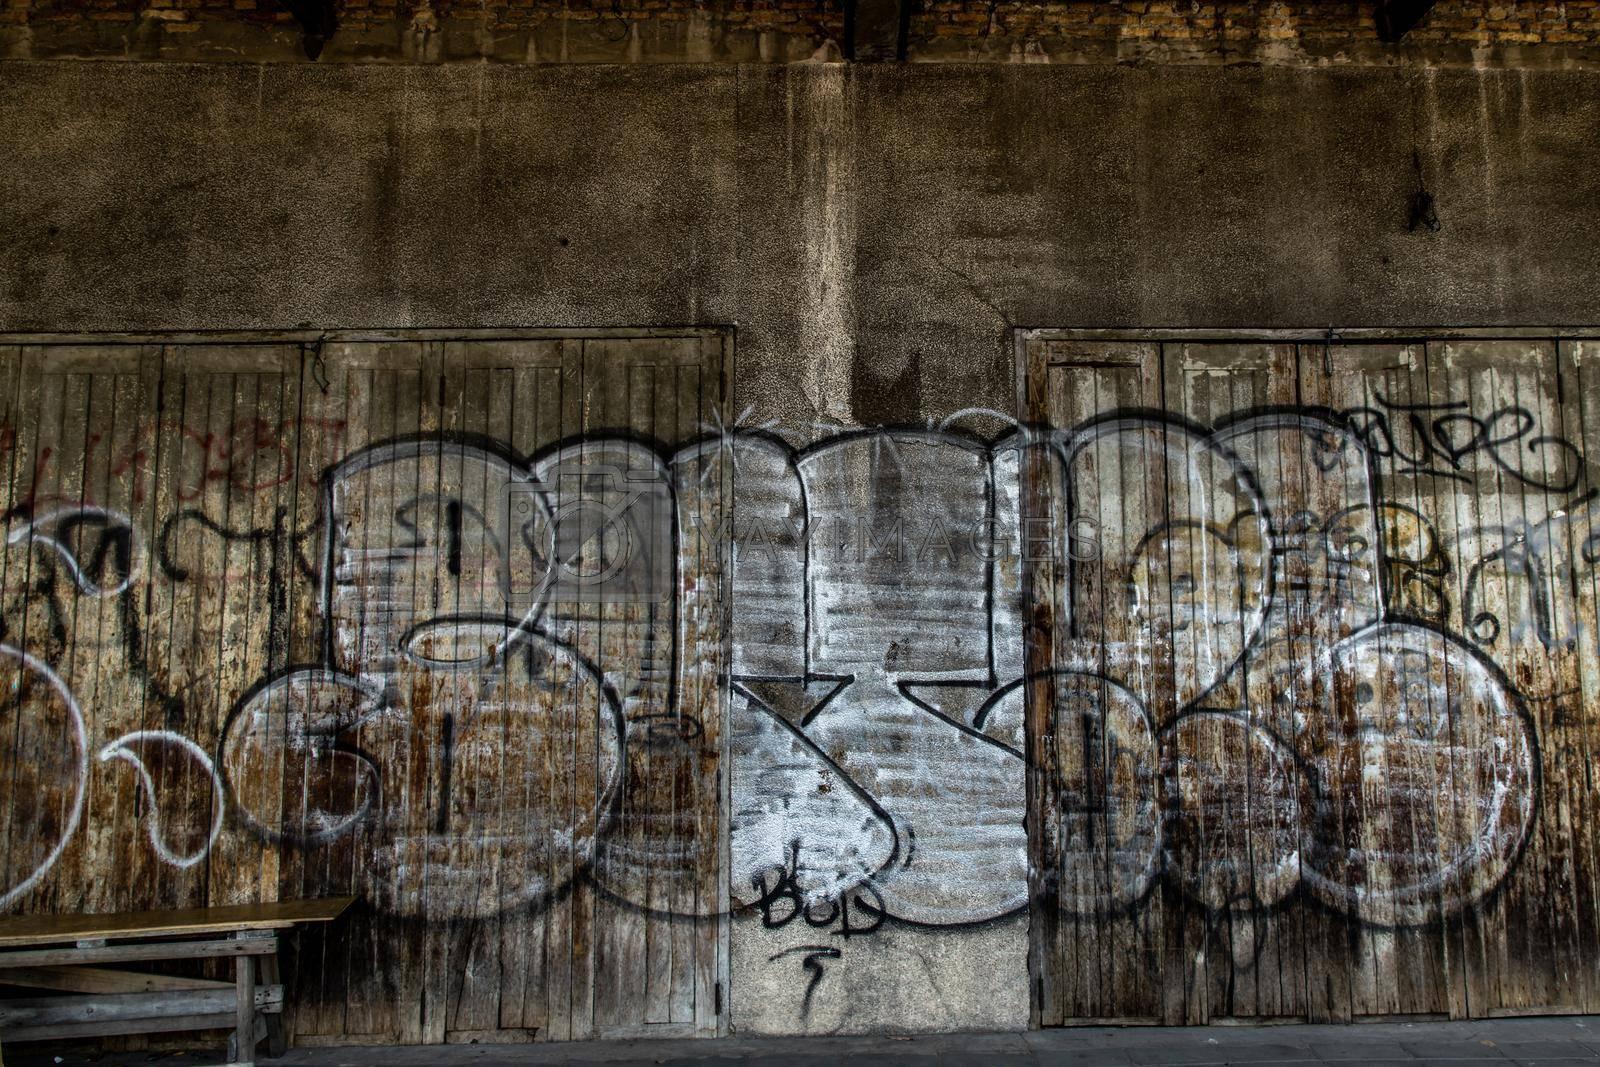 Bangkok, Thailand - Dec 12, 2019 : Wood vintage door on the old wall and graffiti painting.